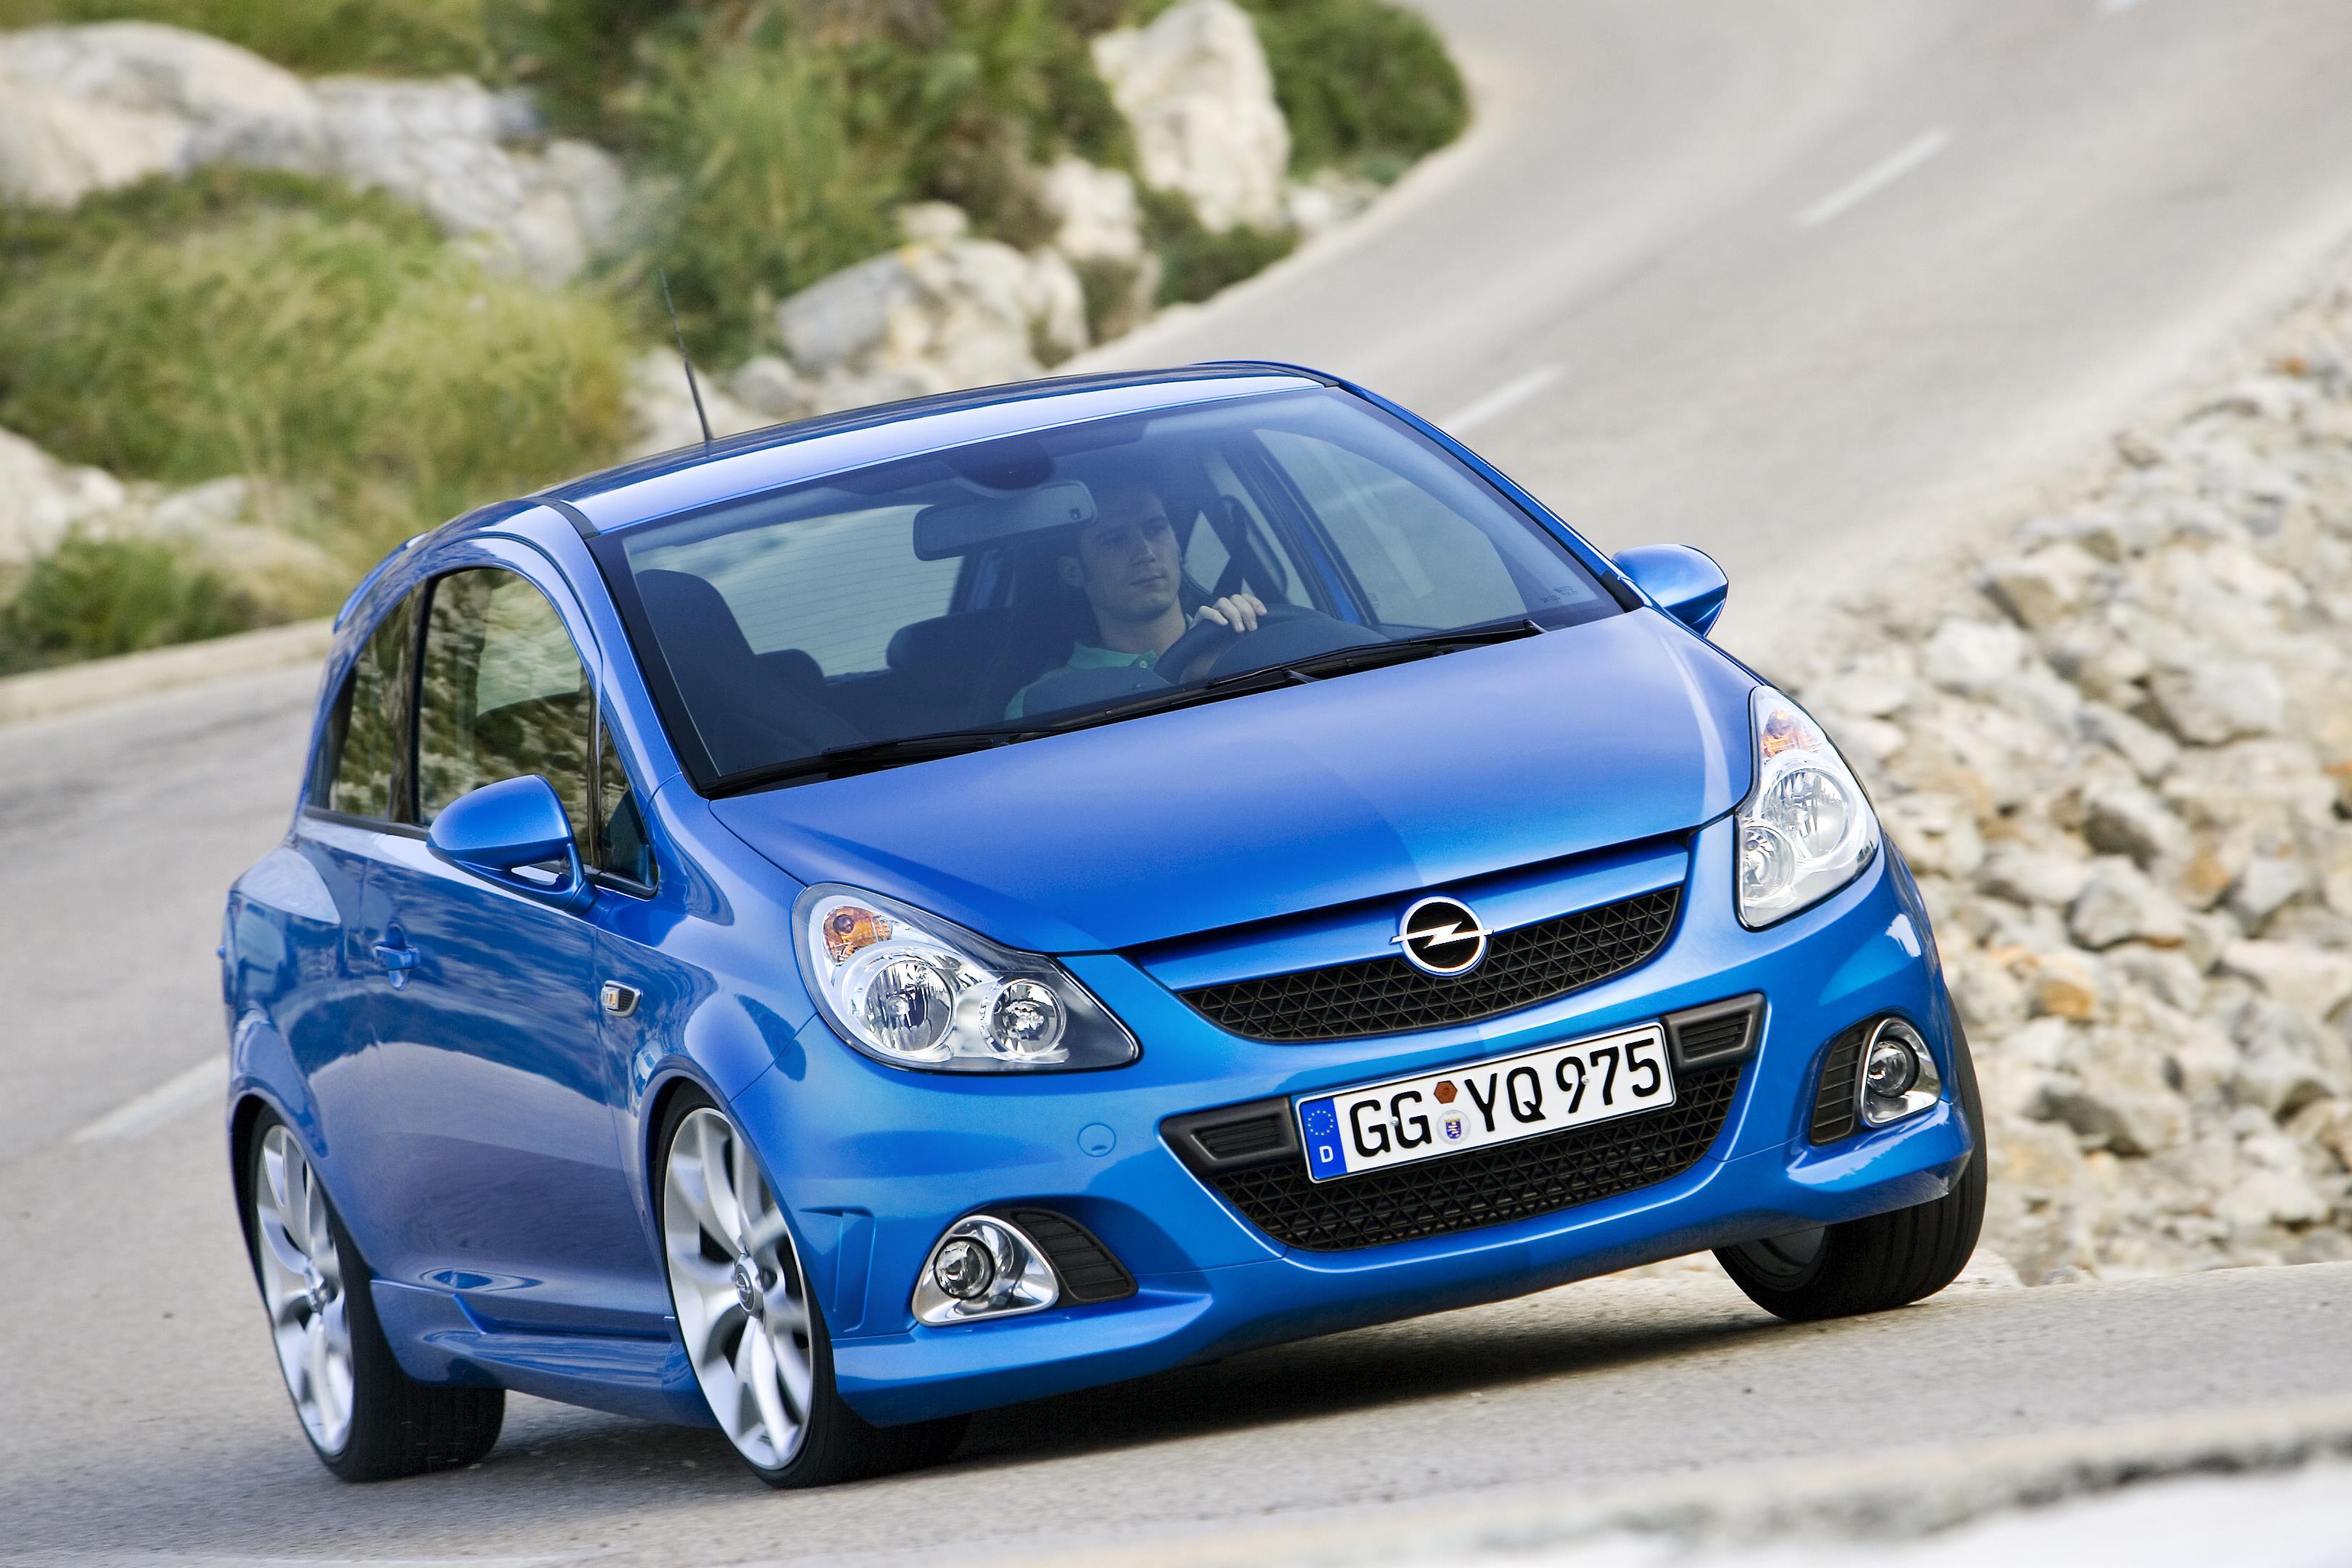 Как снимается передний бампер Opel Corsa D